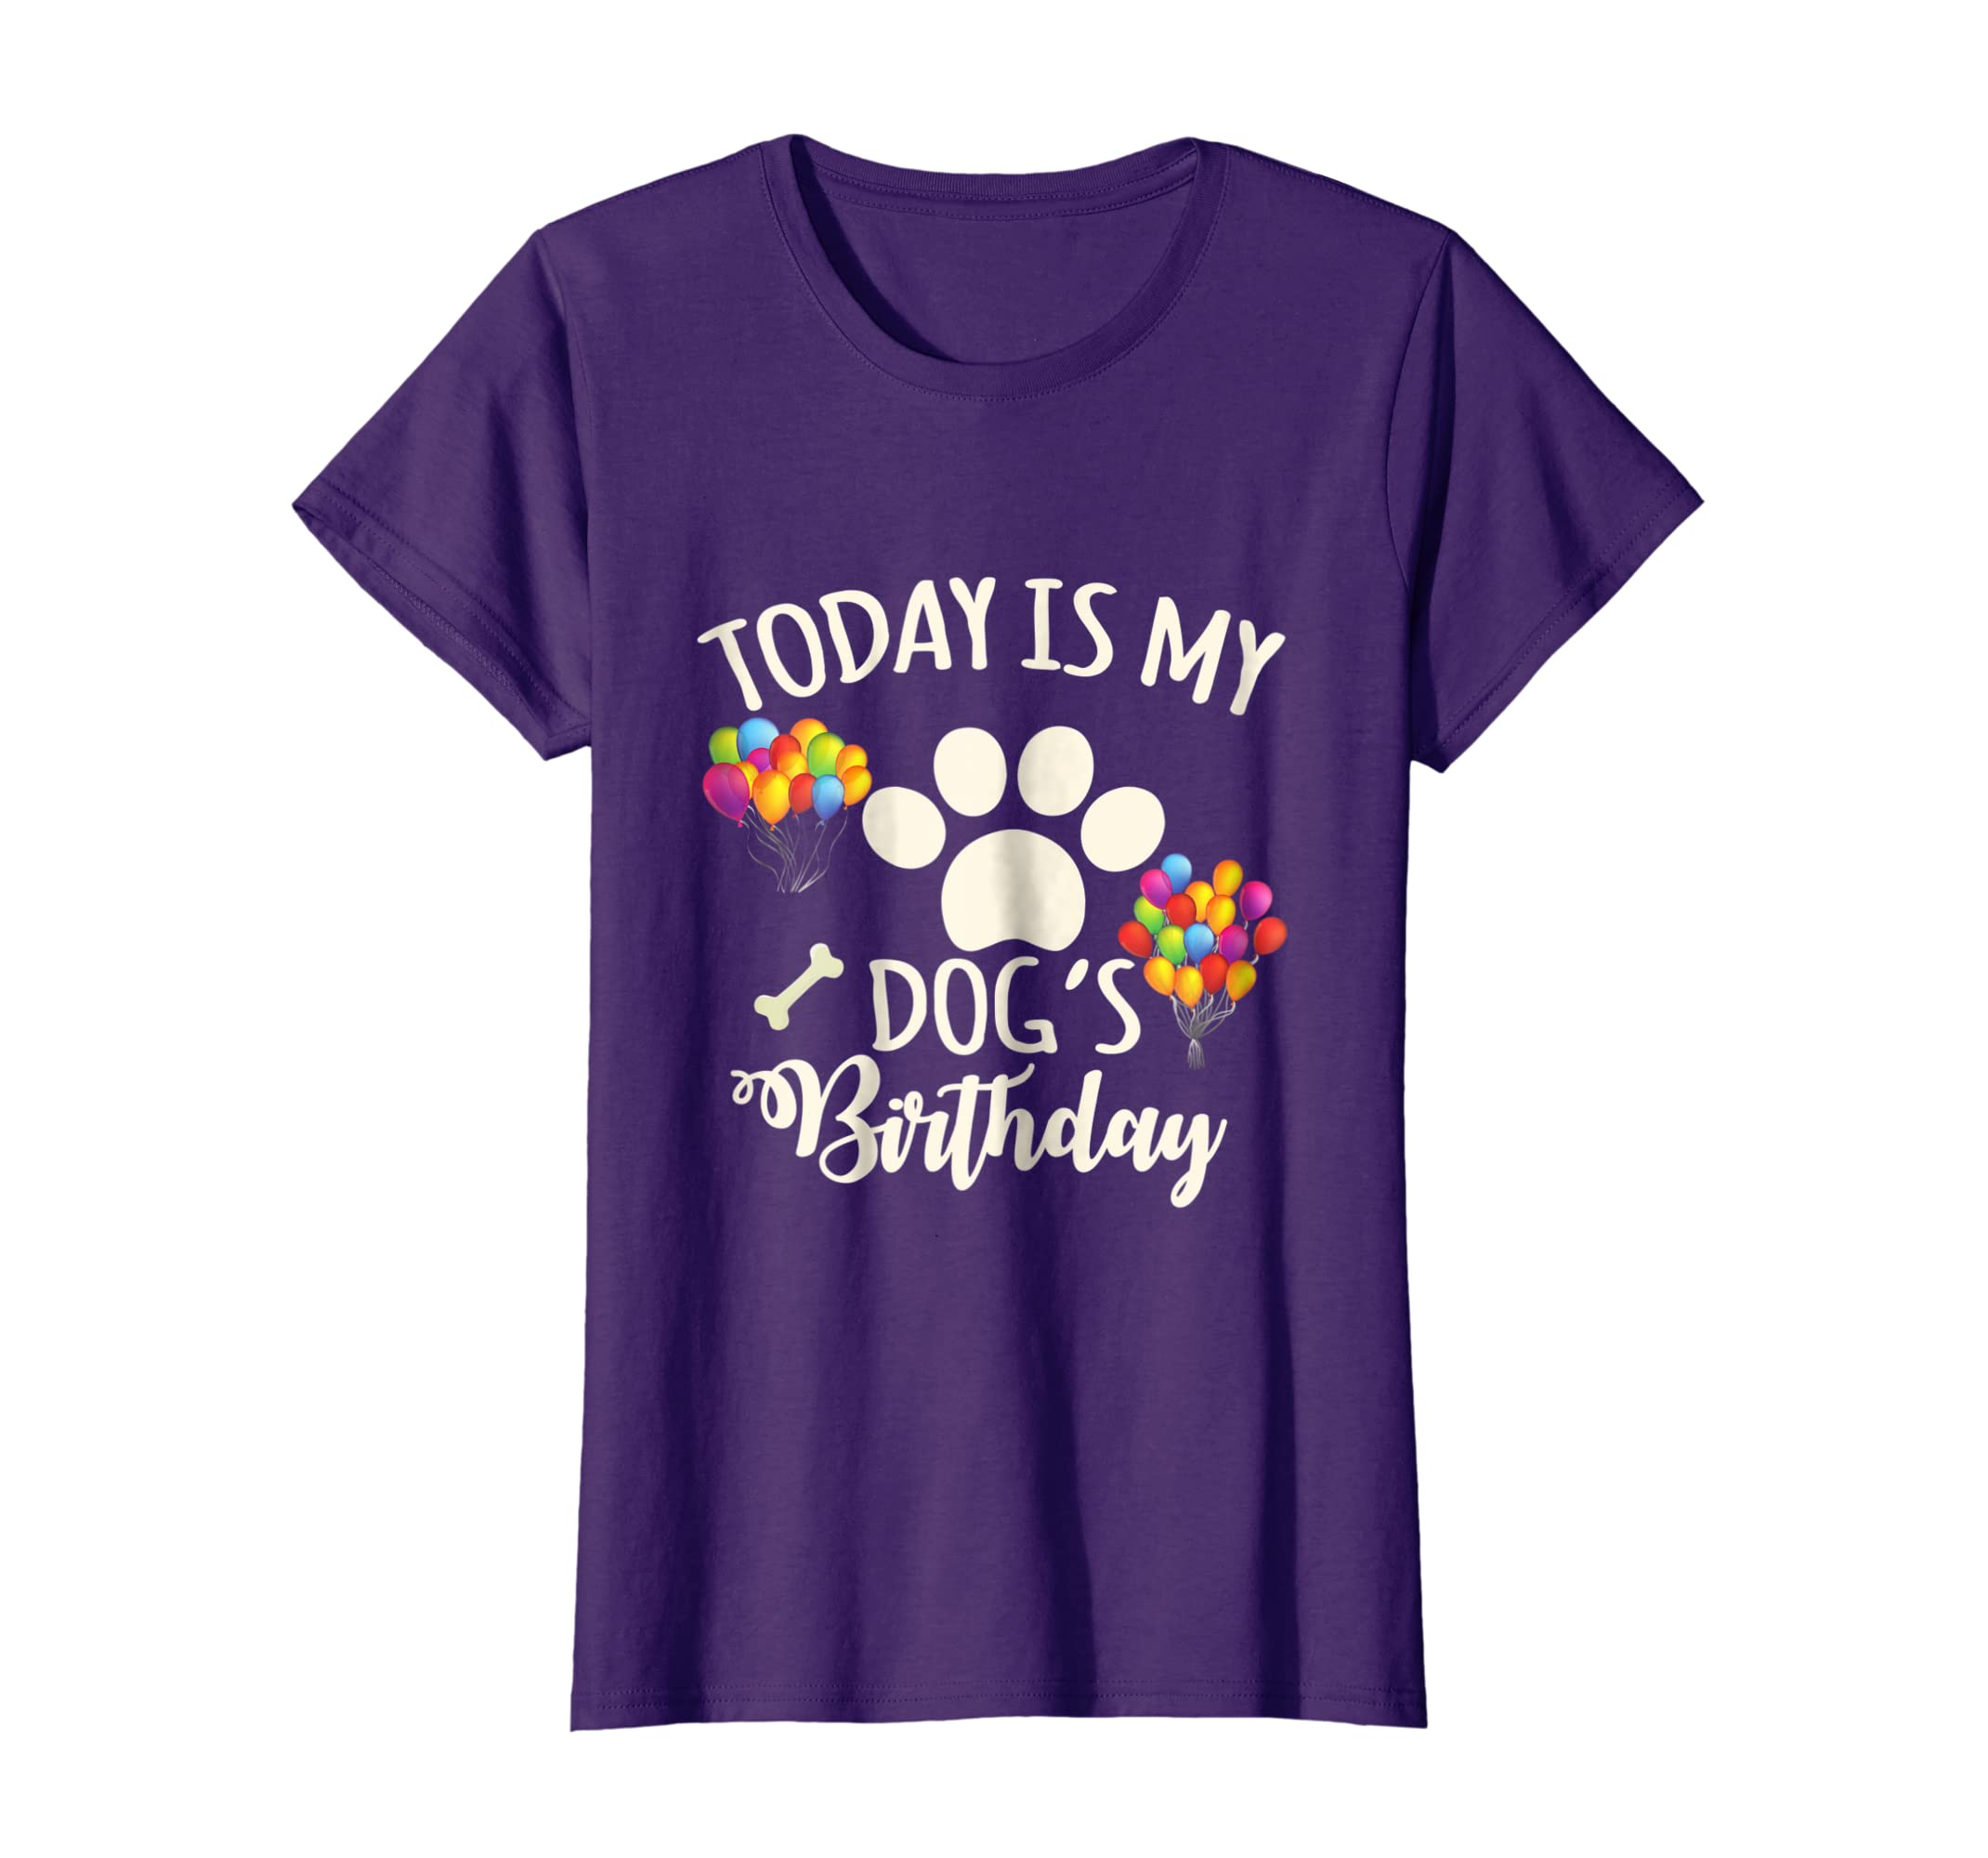 eb2ed6b5e8ad Amazon.com: Today is My Dog's Birthday Shirt - Dog Lover T-Shirt: Clothing